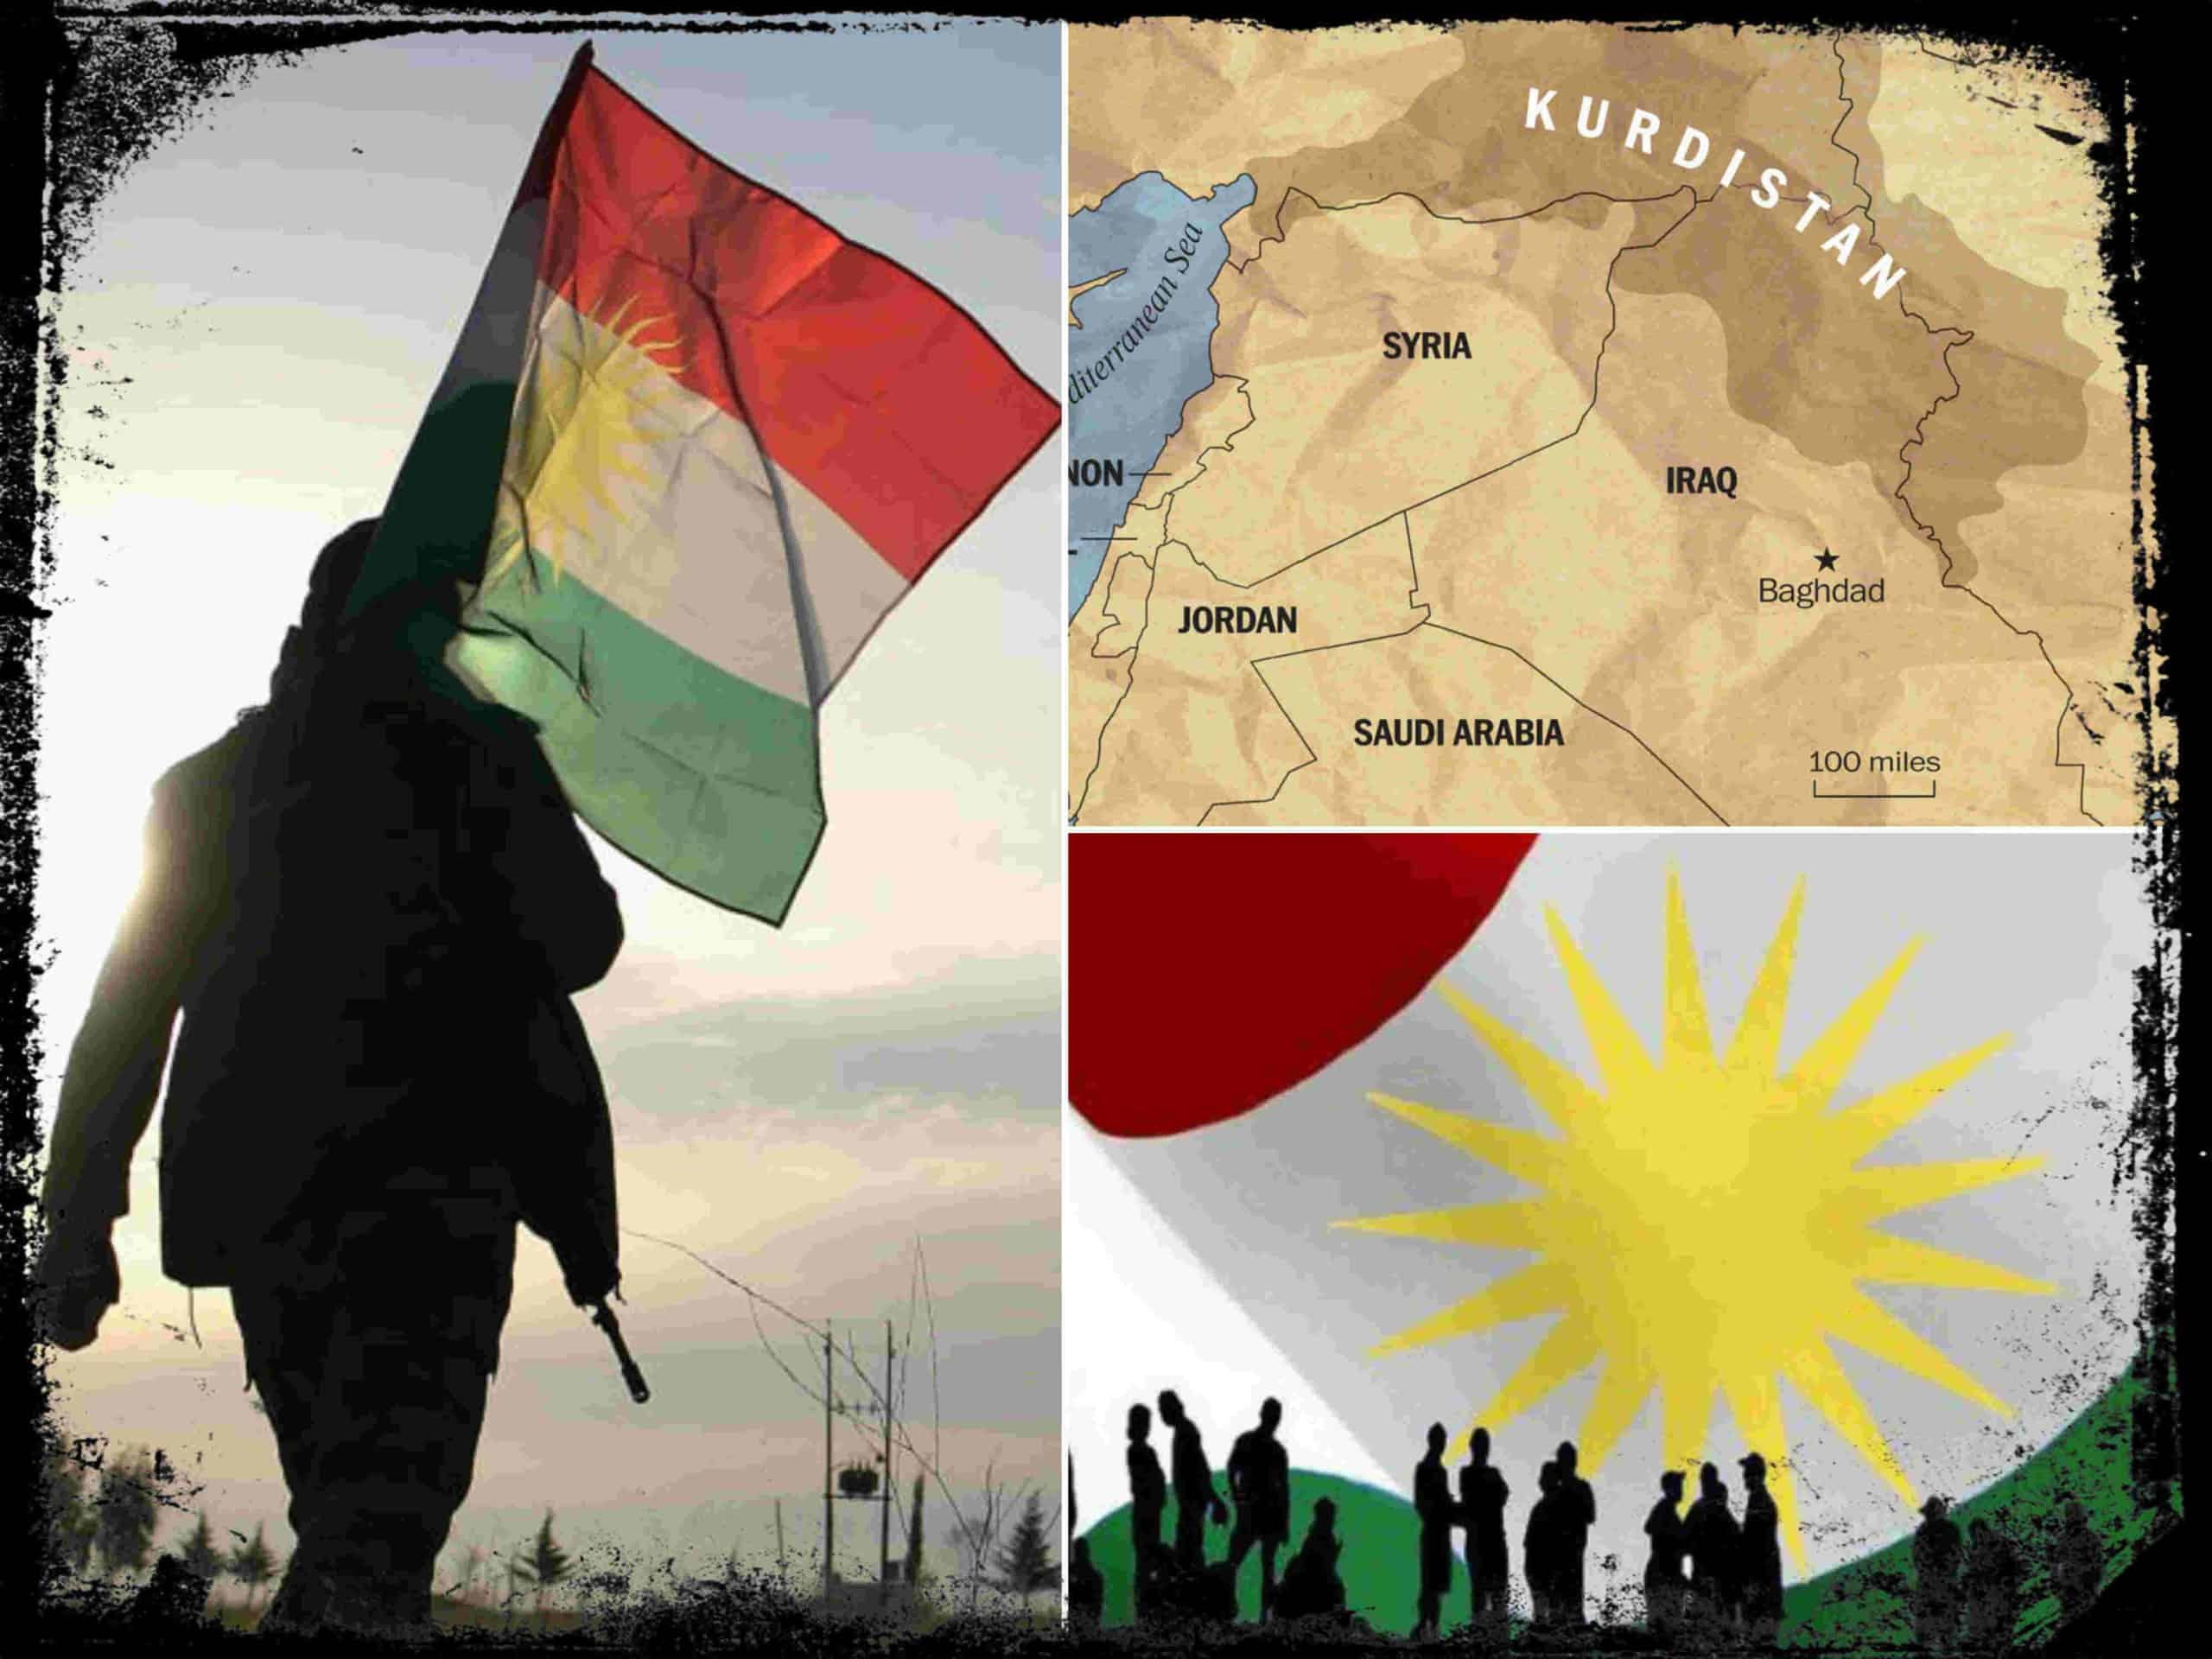 Kurdistán, el país inexistente